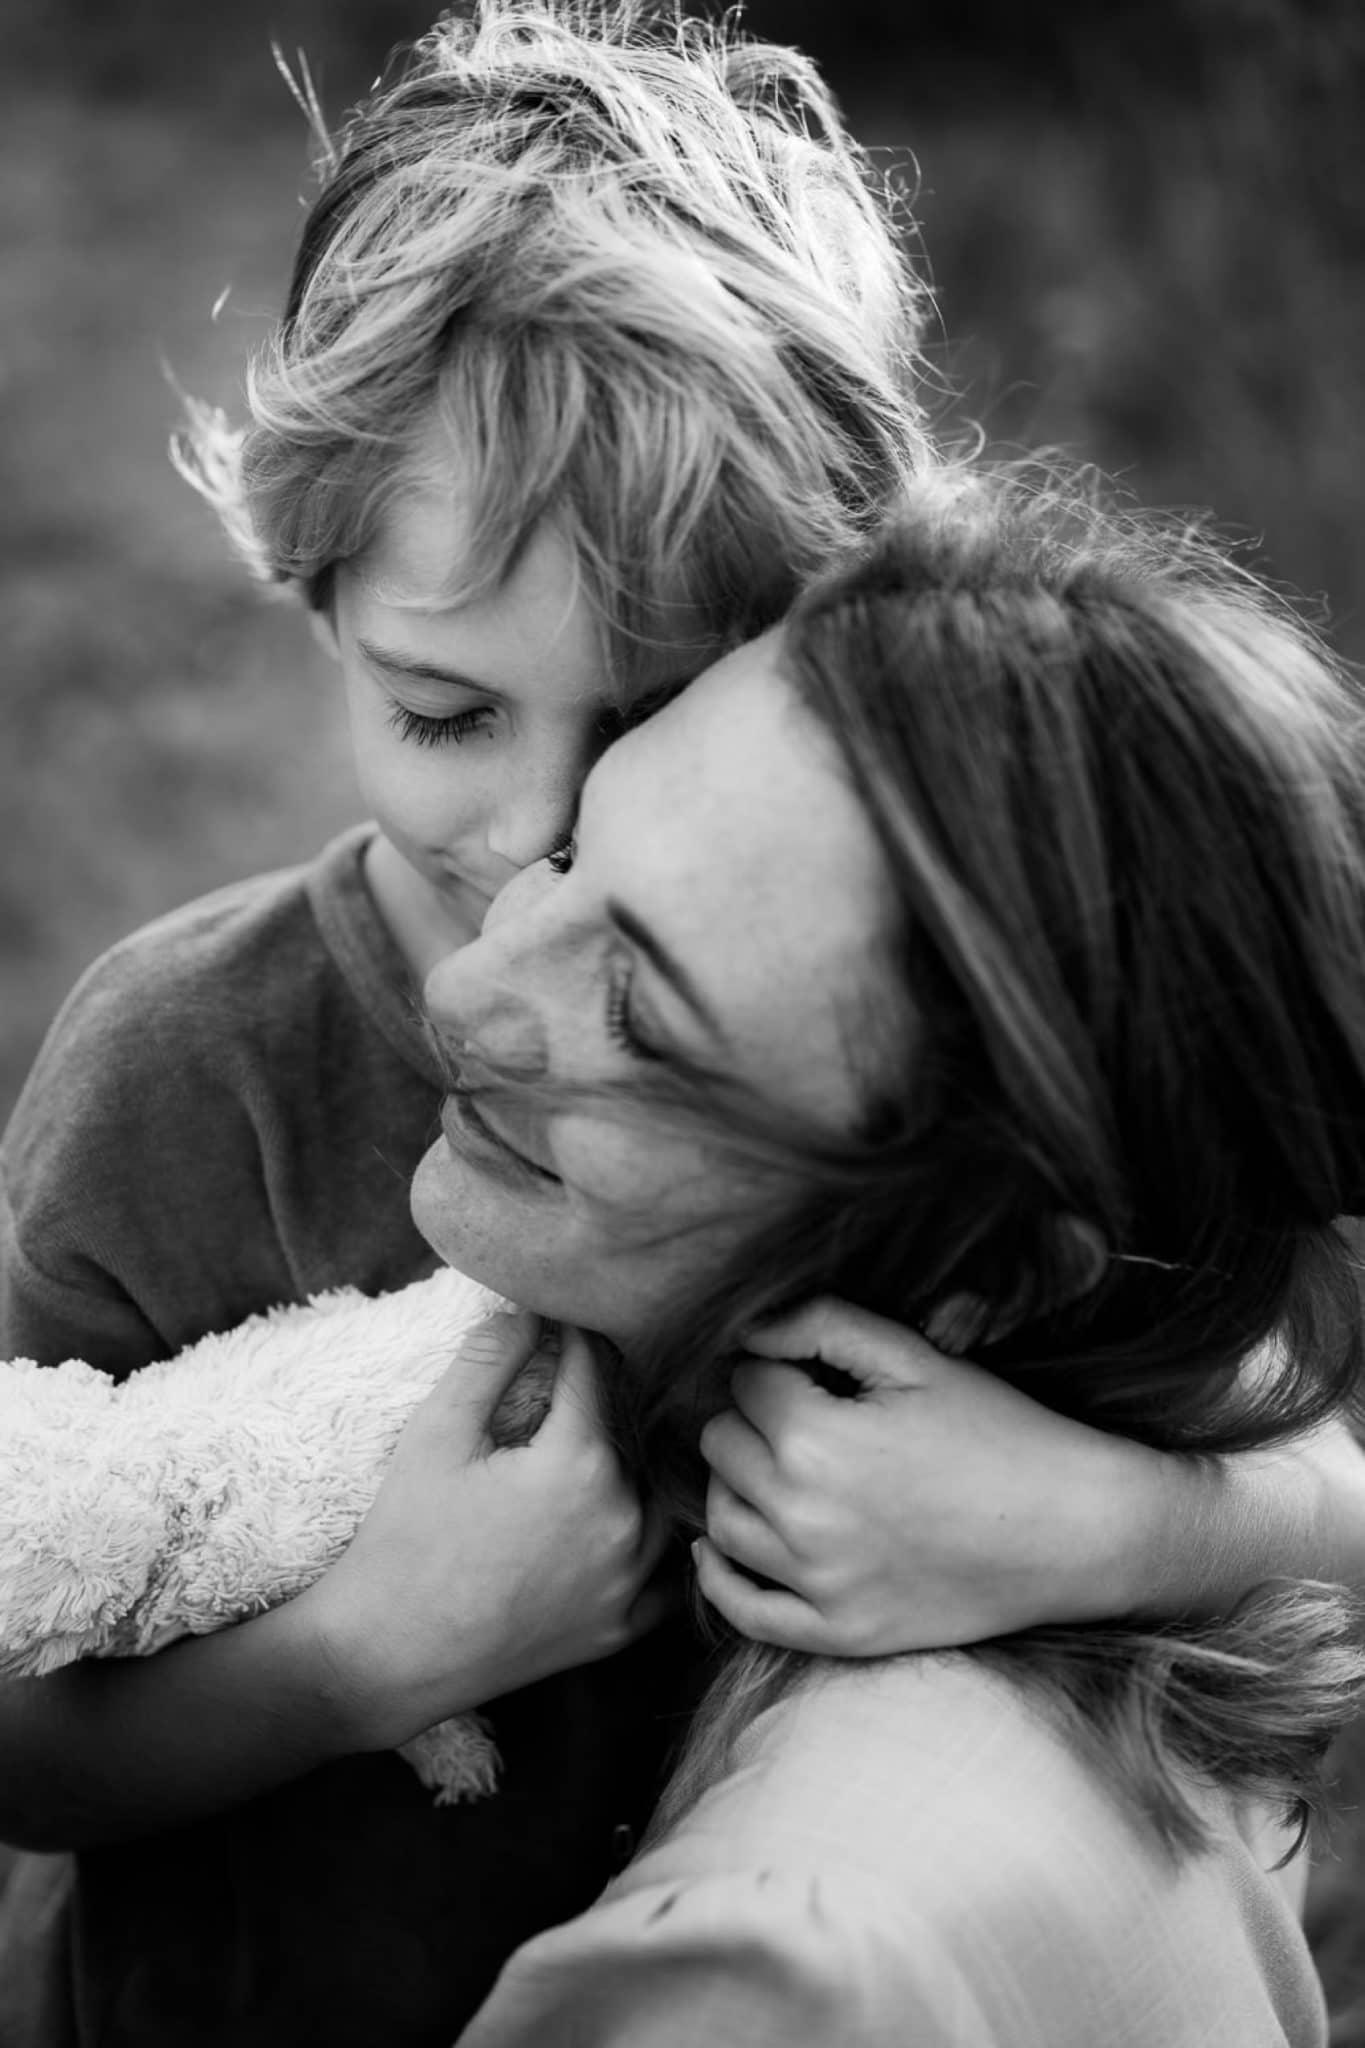 mam and son sardinia photo